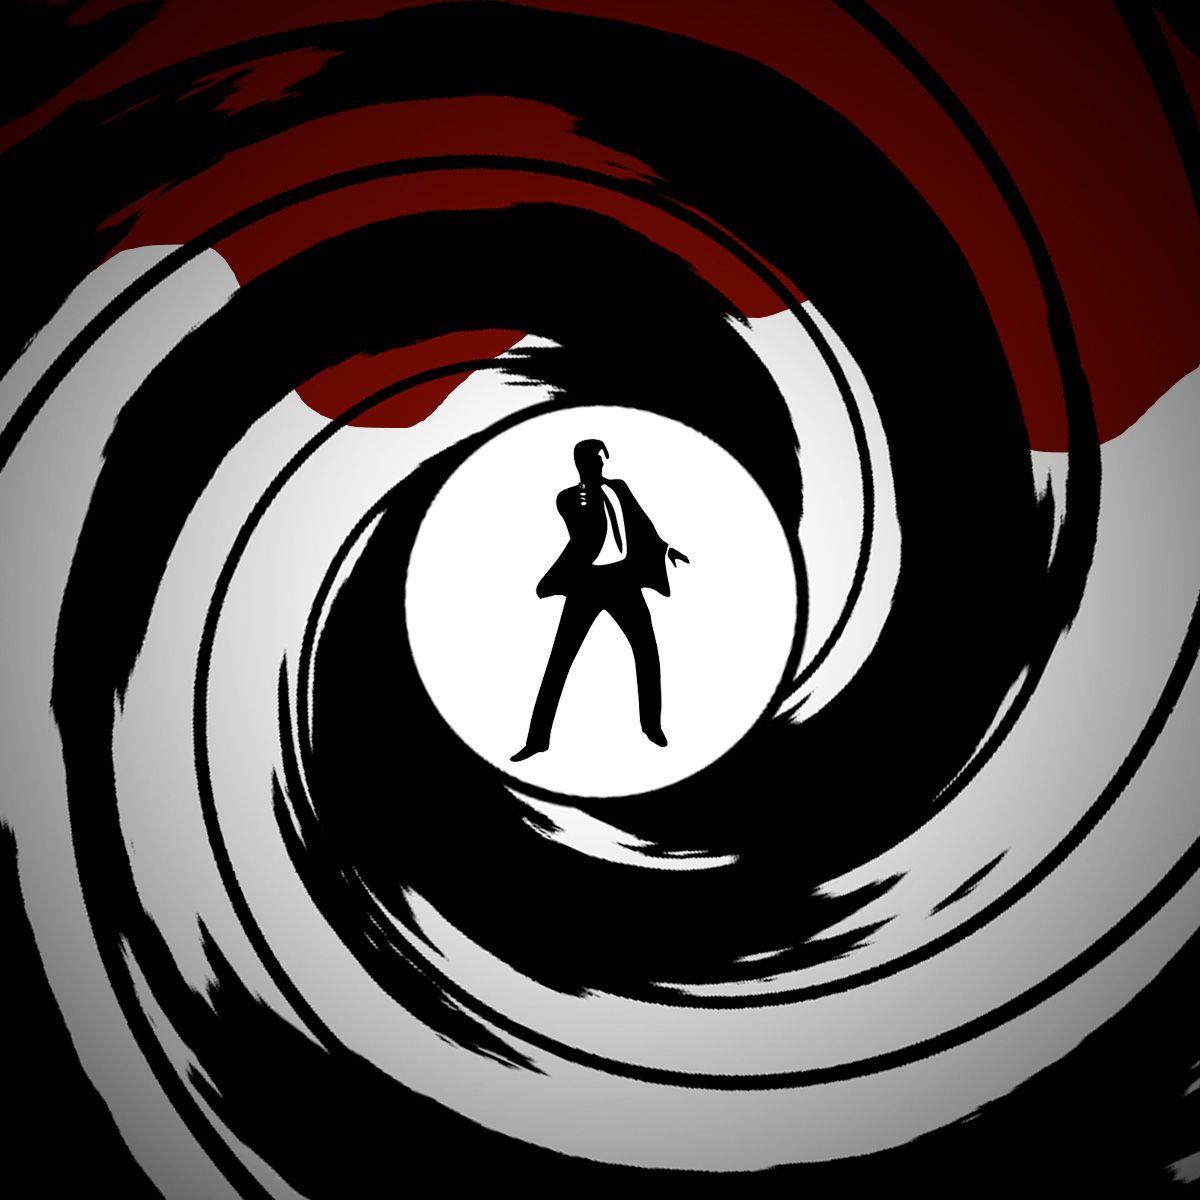 Pin By Natalie On Fyb James Bond Spectre James Bond Bond